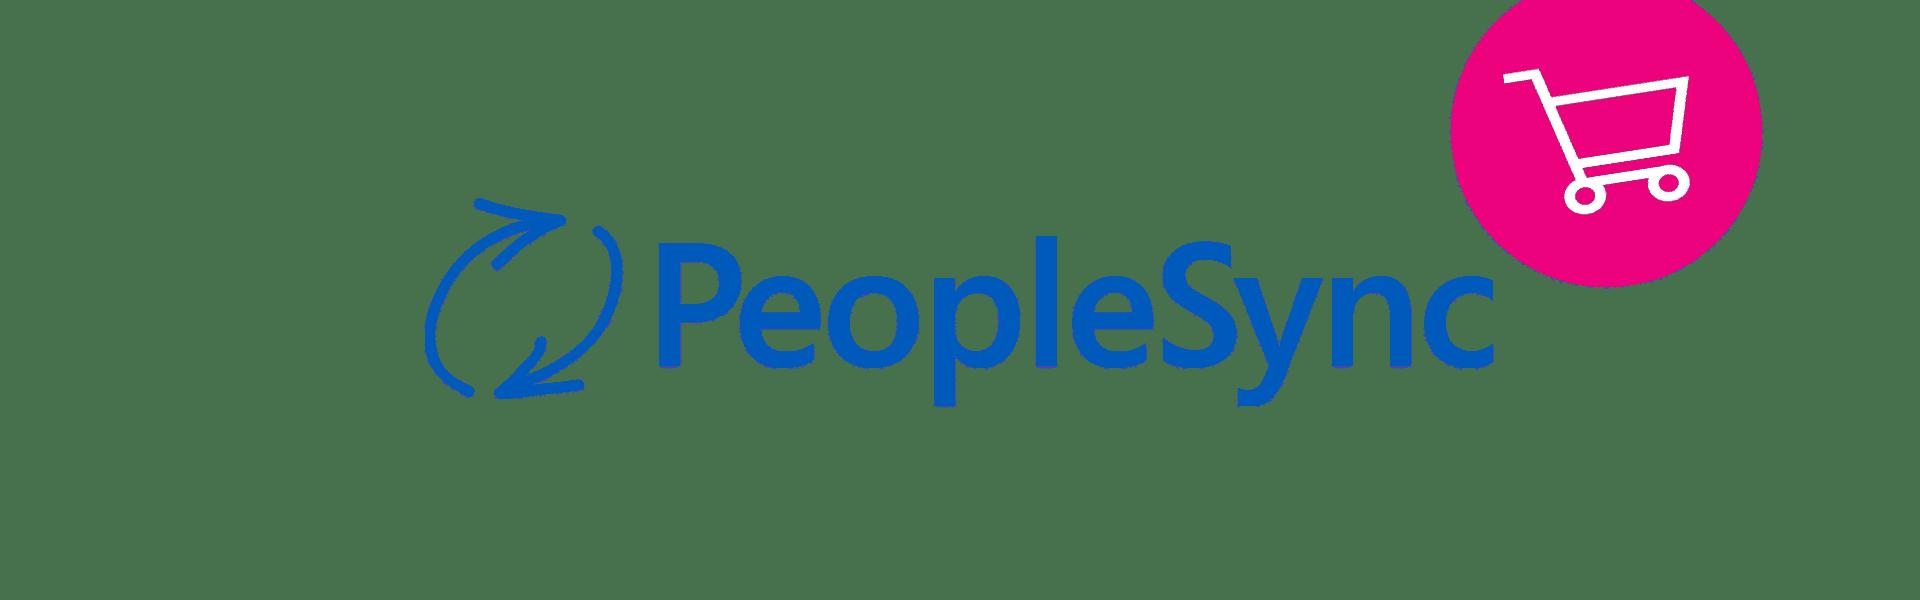 messageconcept peoplesync cart